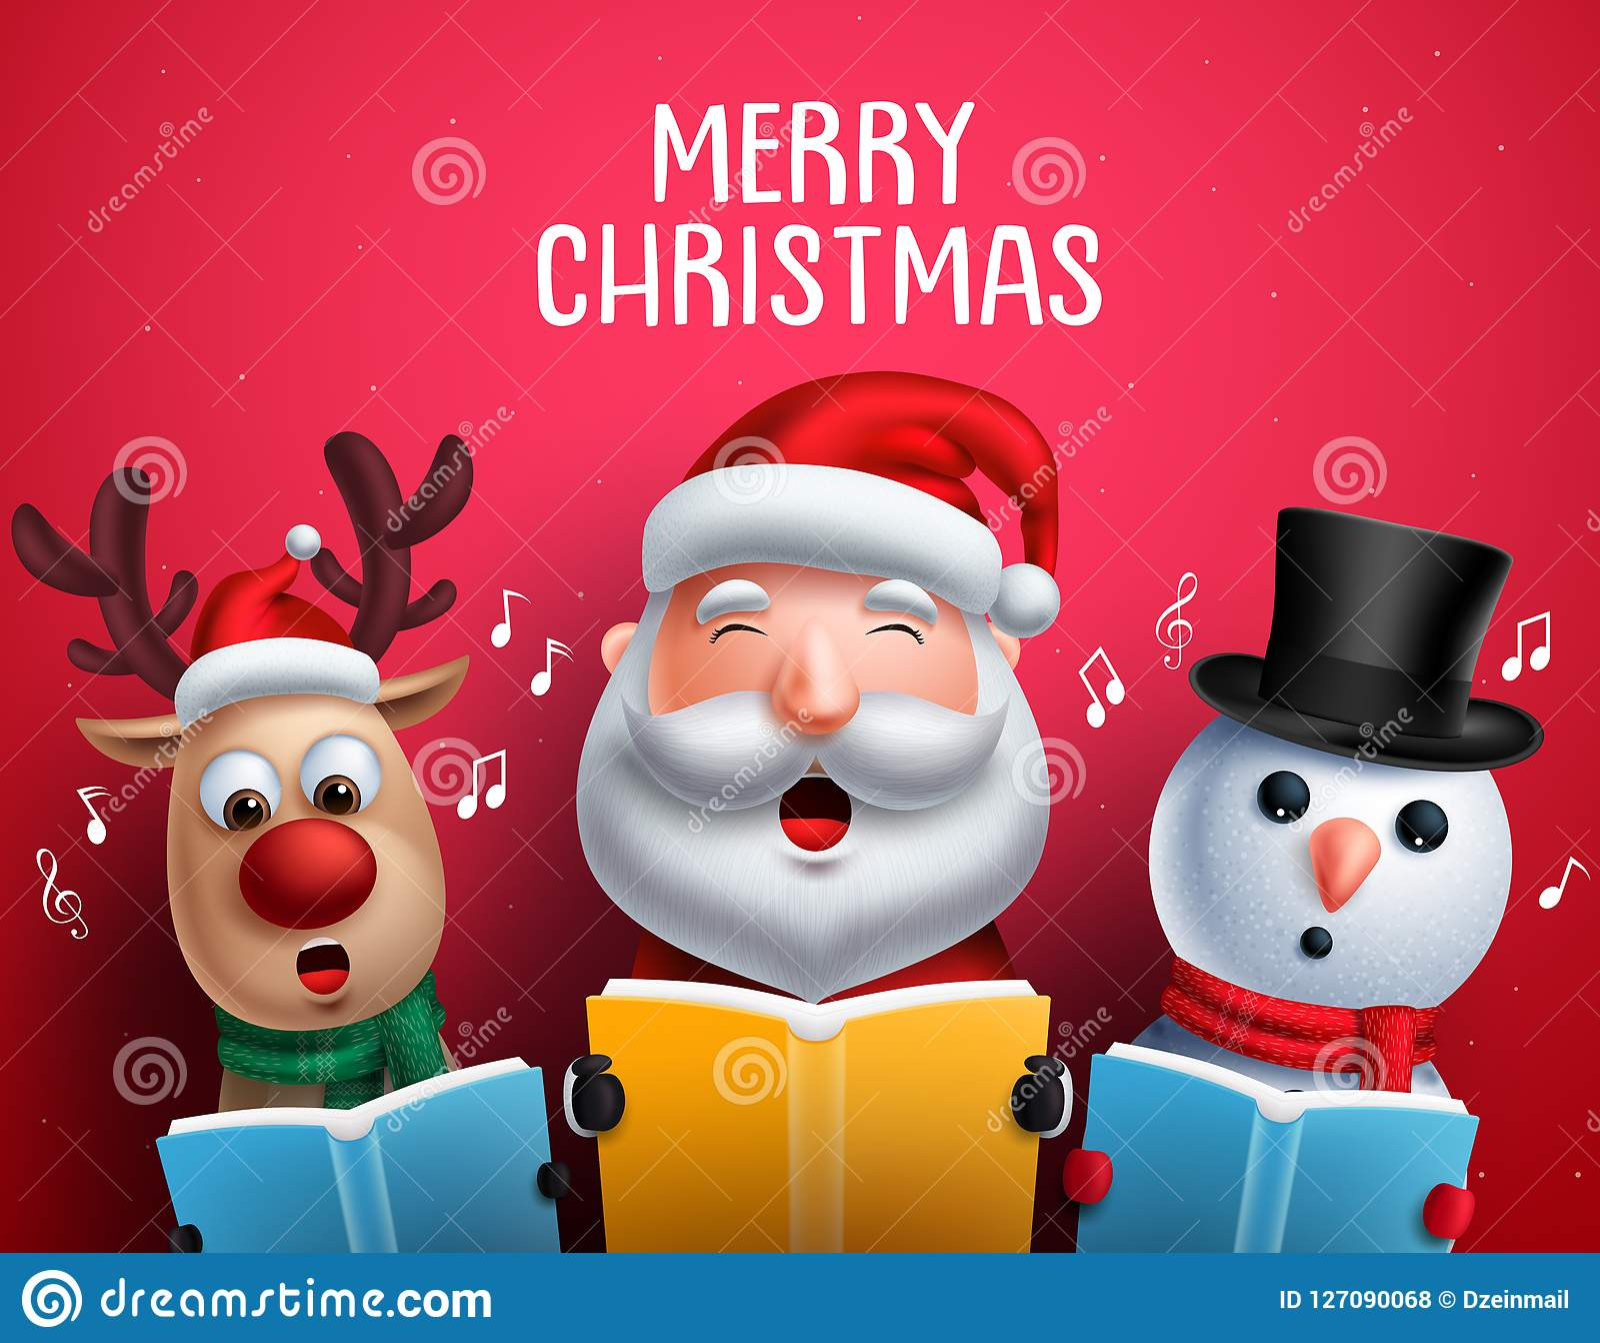 Christmas carol book characters. A Christmas Carol Summary. 2019-02-20